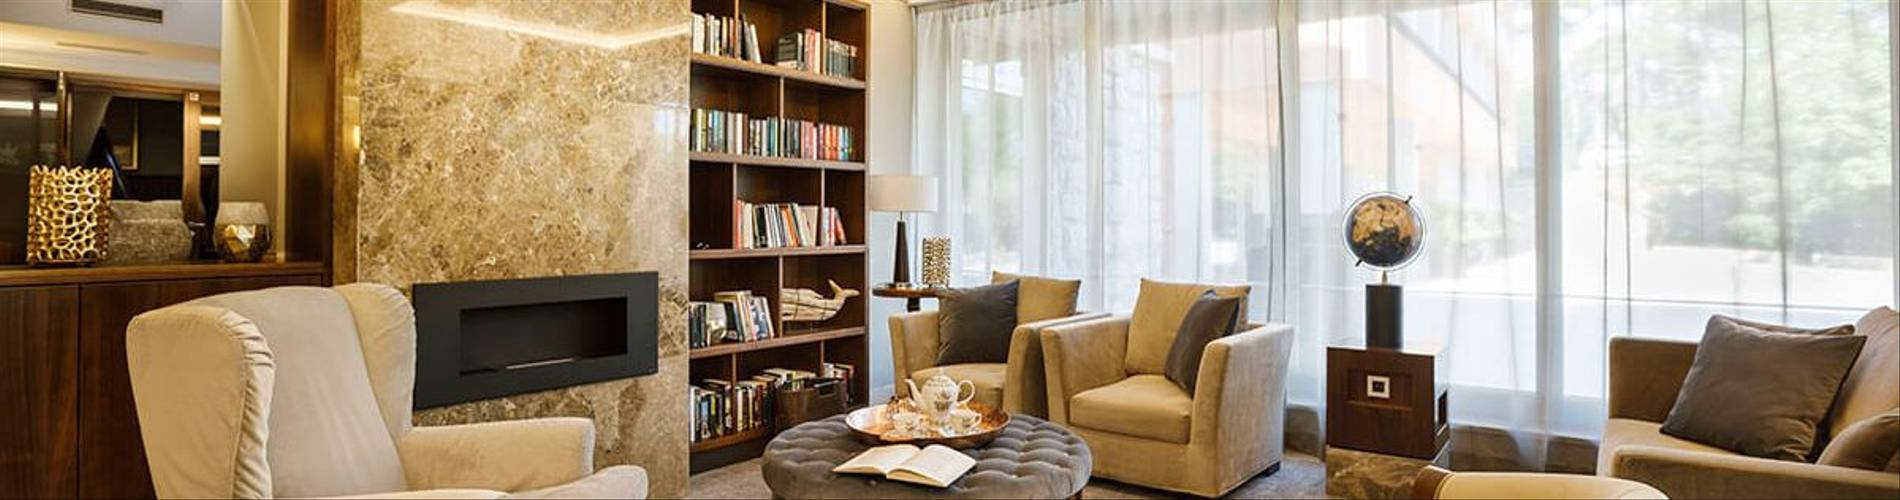 valamar-imperial-hotel-library-closeup.jpg